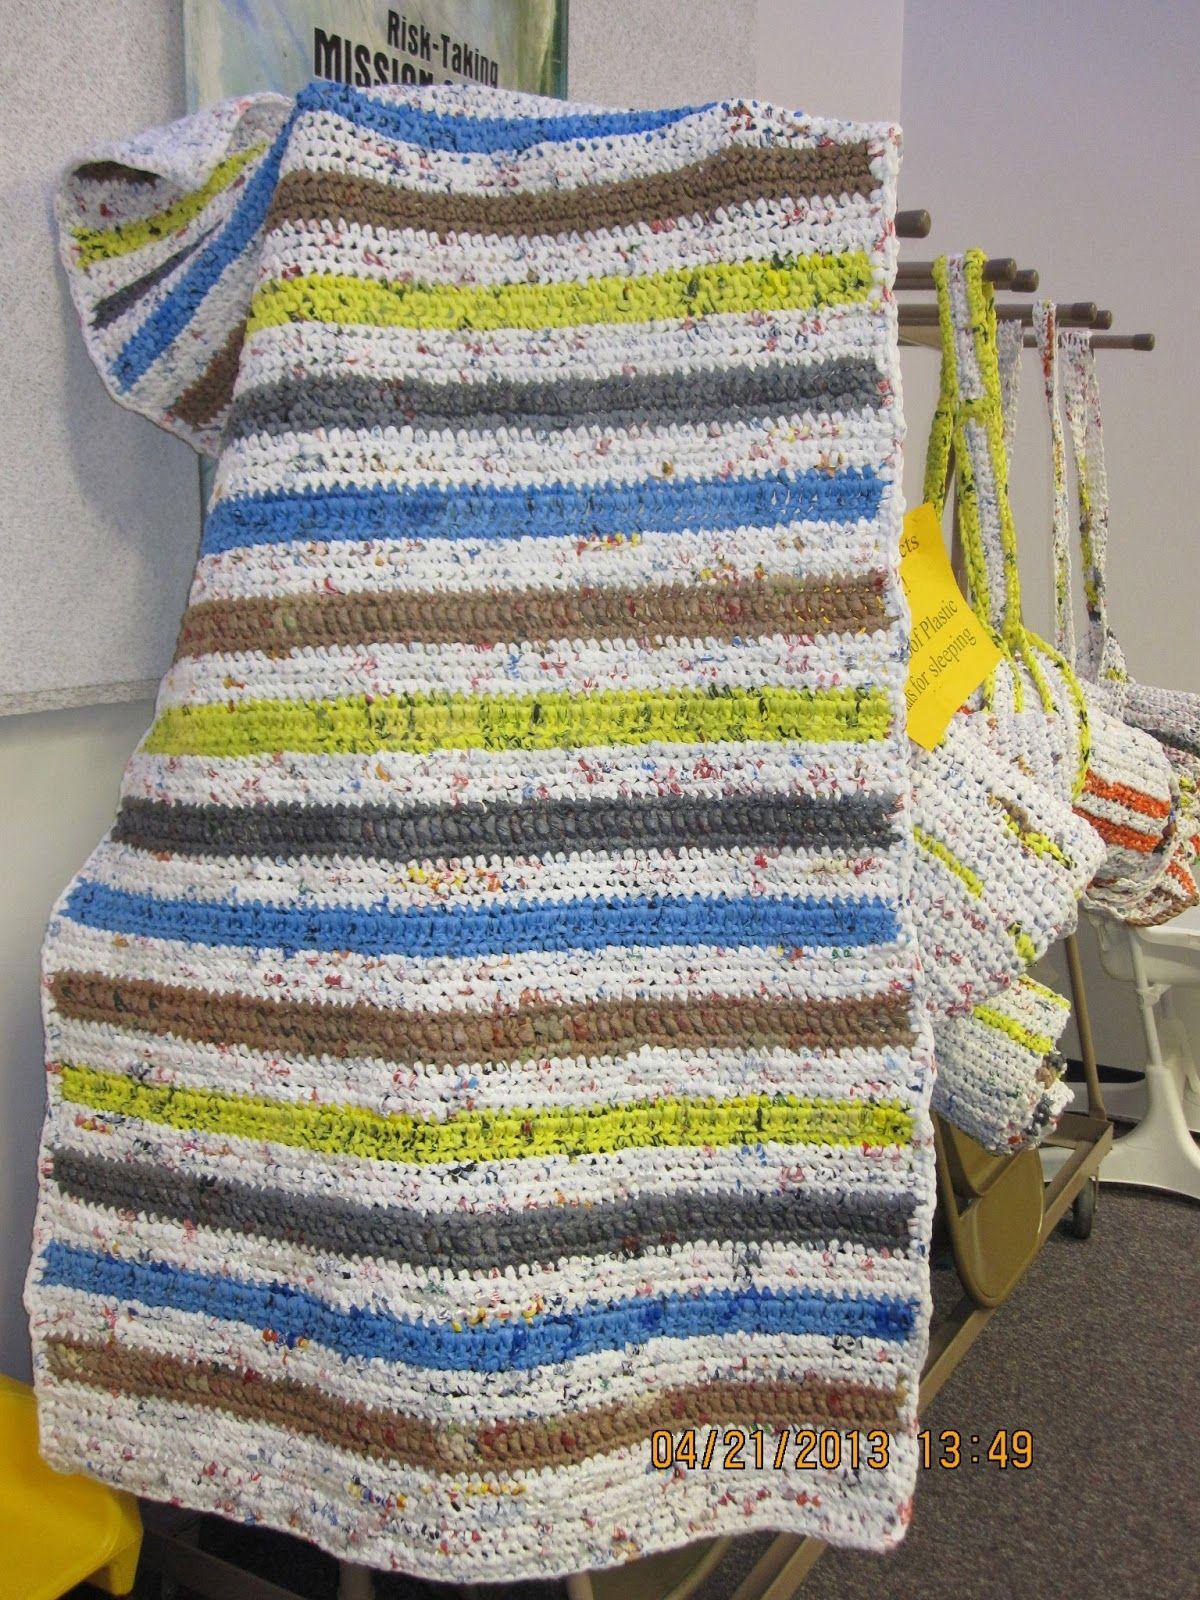 Using My Talent Bag Count 57 Plastic Bag Crochet Plastic Bag Crafts Plastic Bag